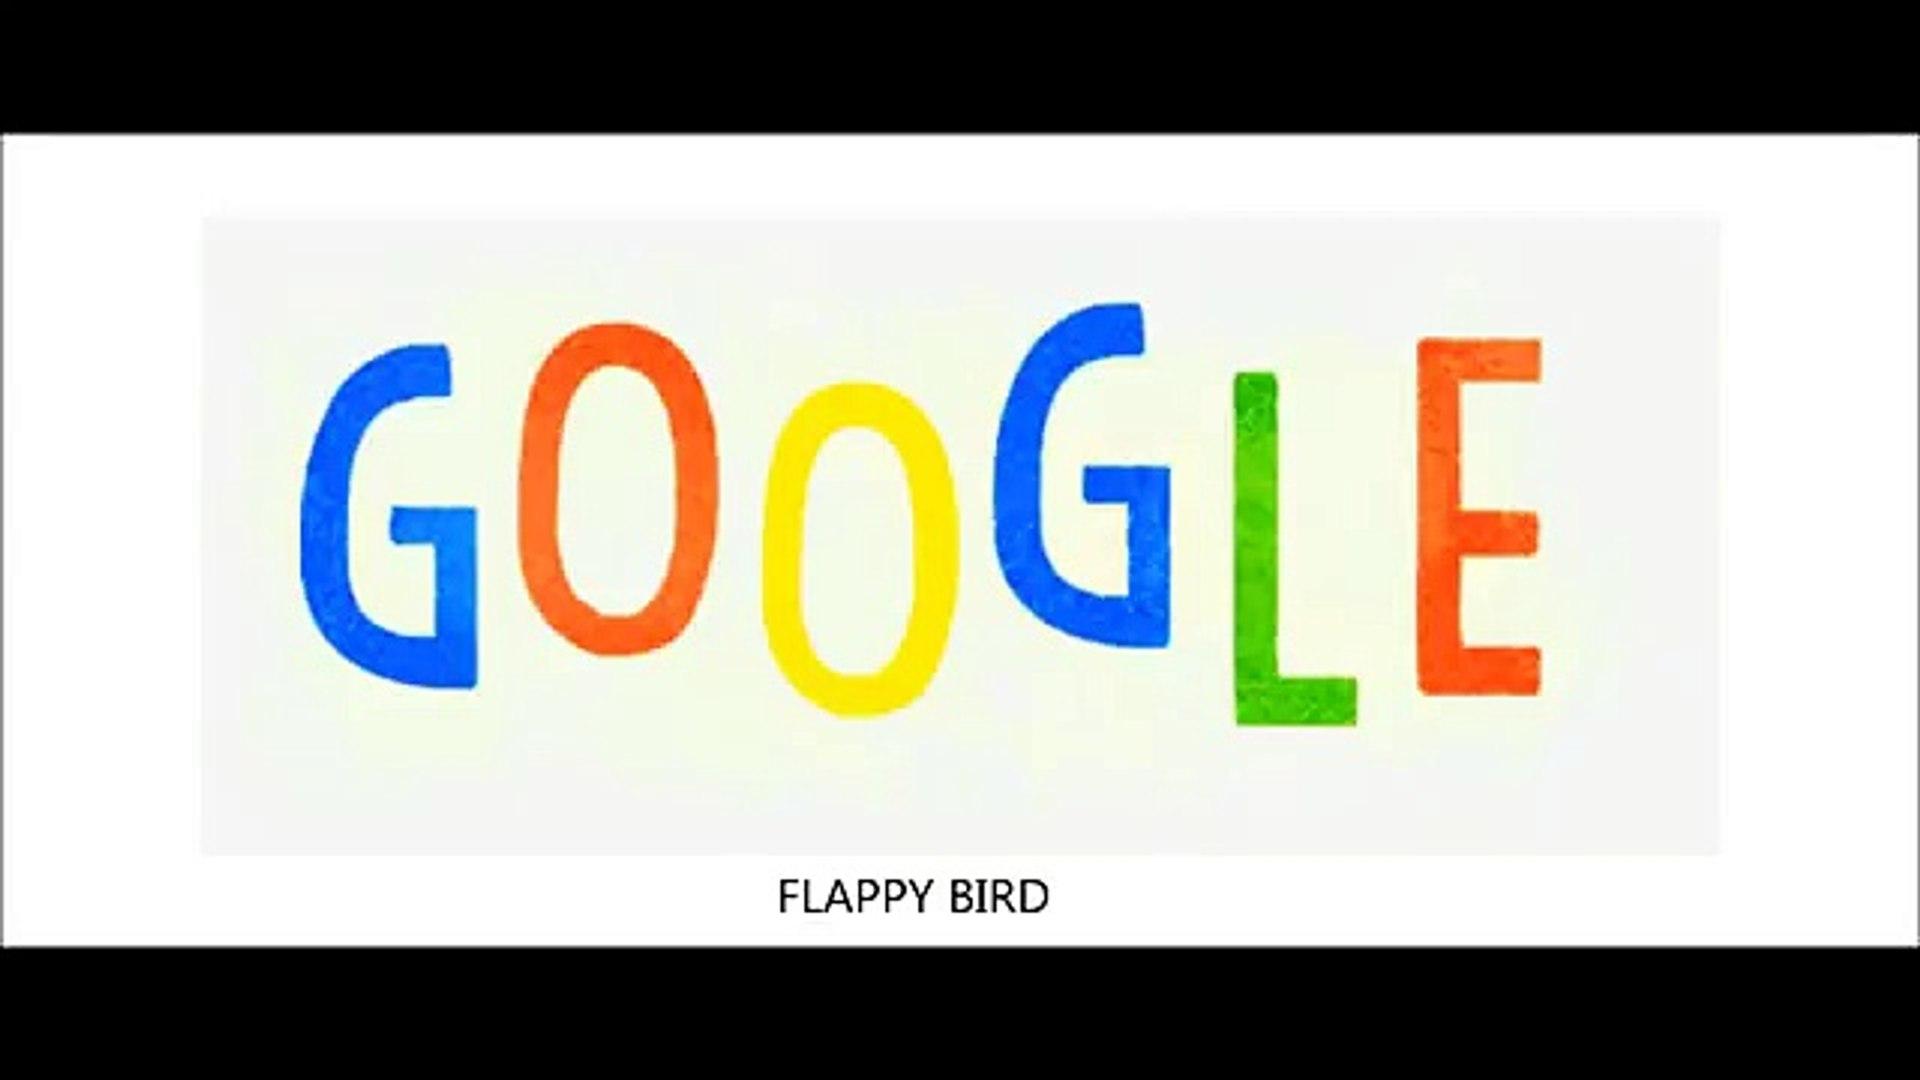 New Year's Eve 2014 - Google Doodle December 31, 2014 (2014 Trending Topics ) (HD)